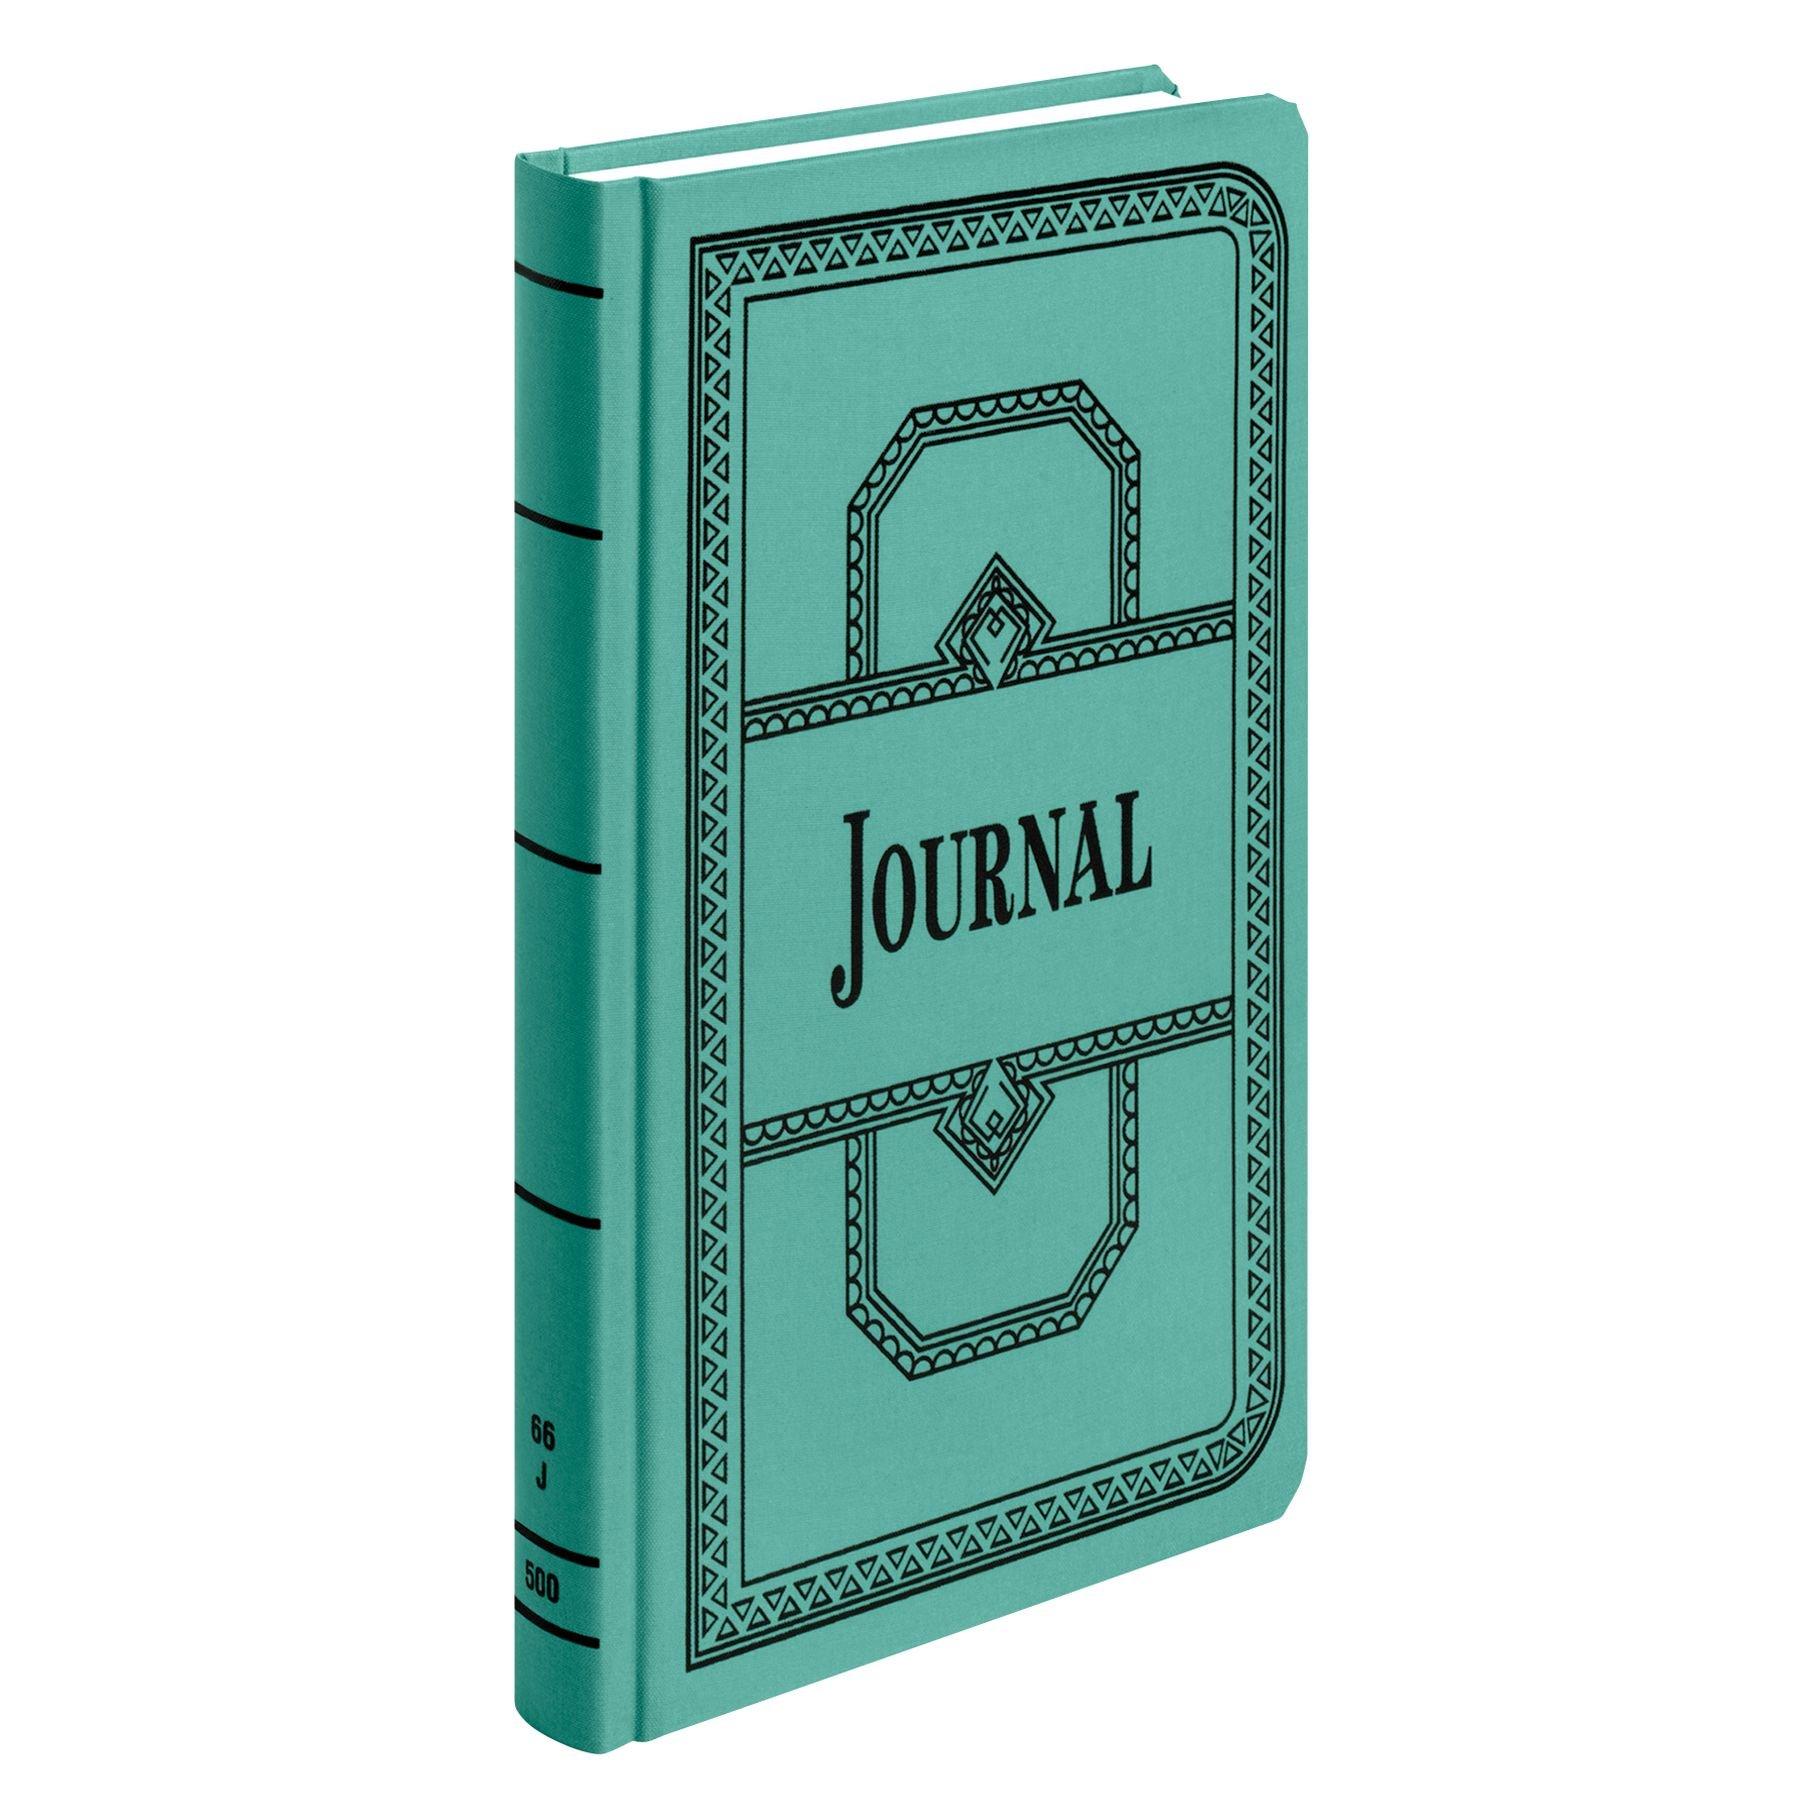 Boorum & Pease 66 Series Account Book, Journal Ruled, Green, 500 Pages, 12-1/8'' x 7-5/8'' (66-500-J) by Boorum & Pease (Image #1)